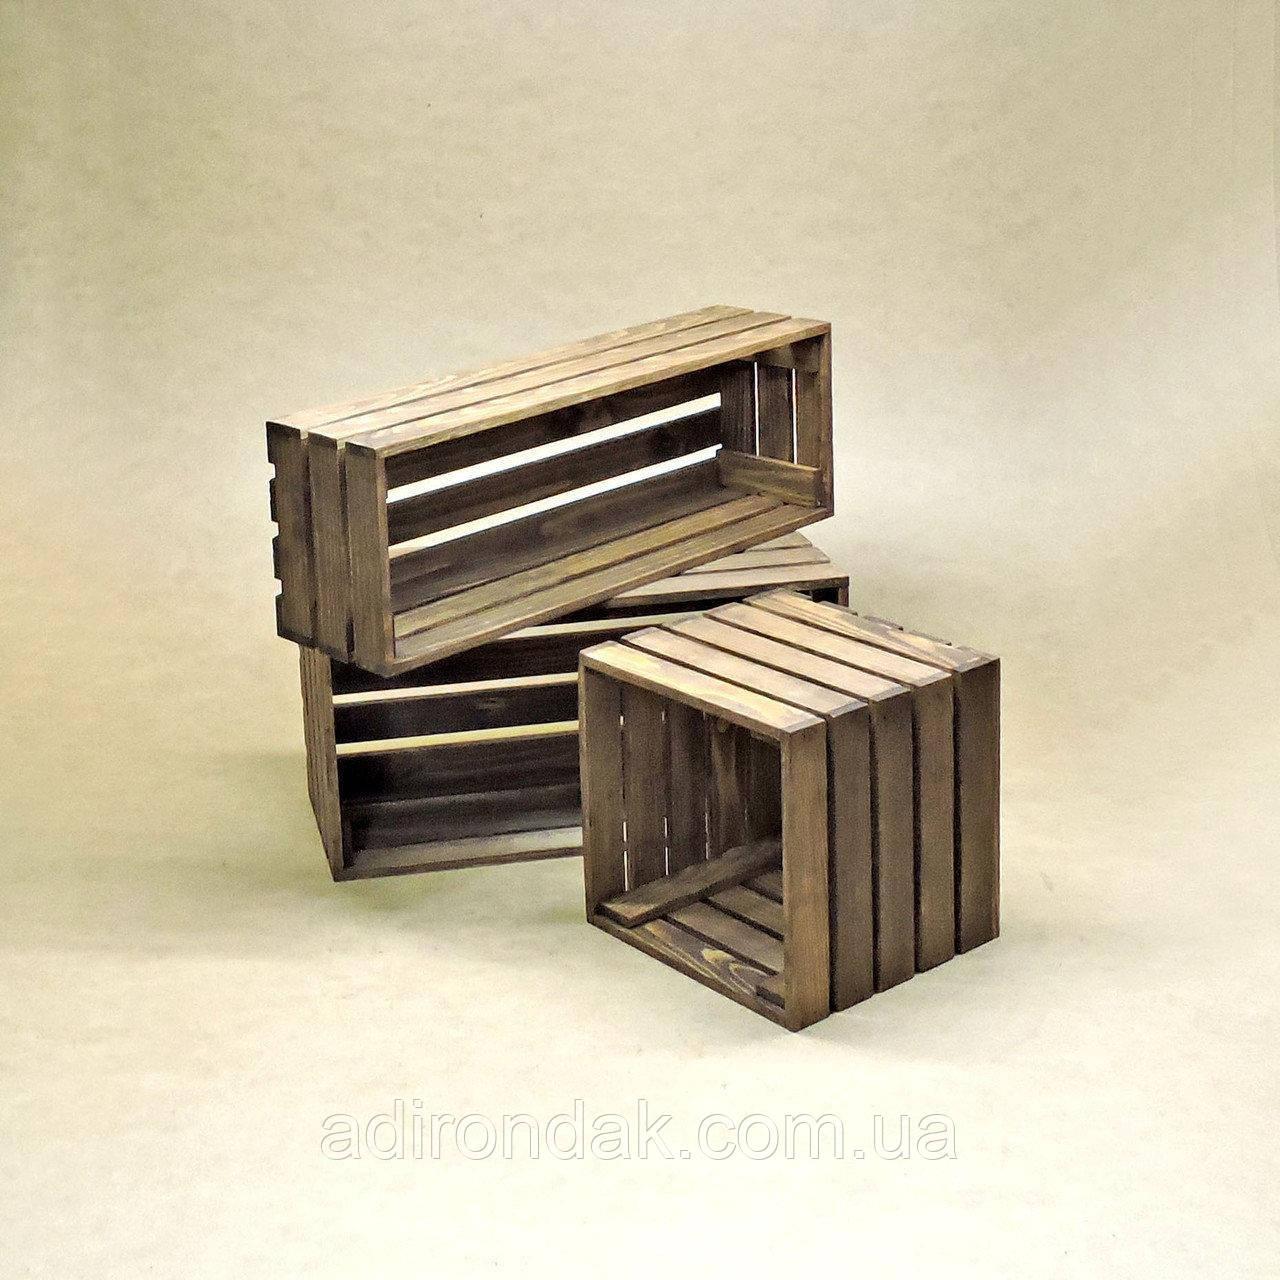 Ящик для хранения Флоренция В60хД70хШ70см, фото 1